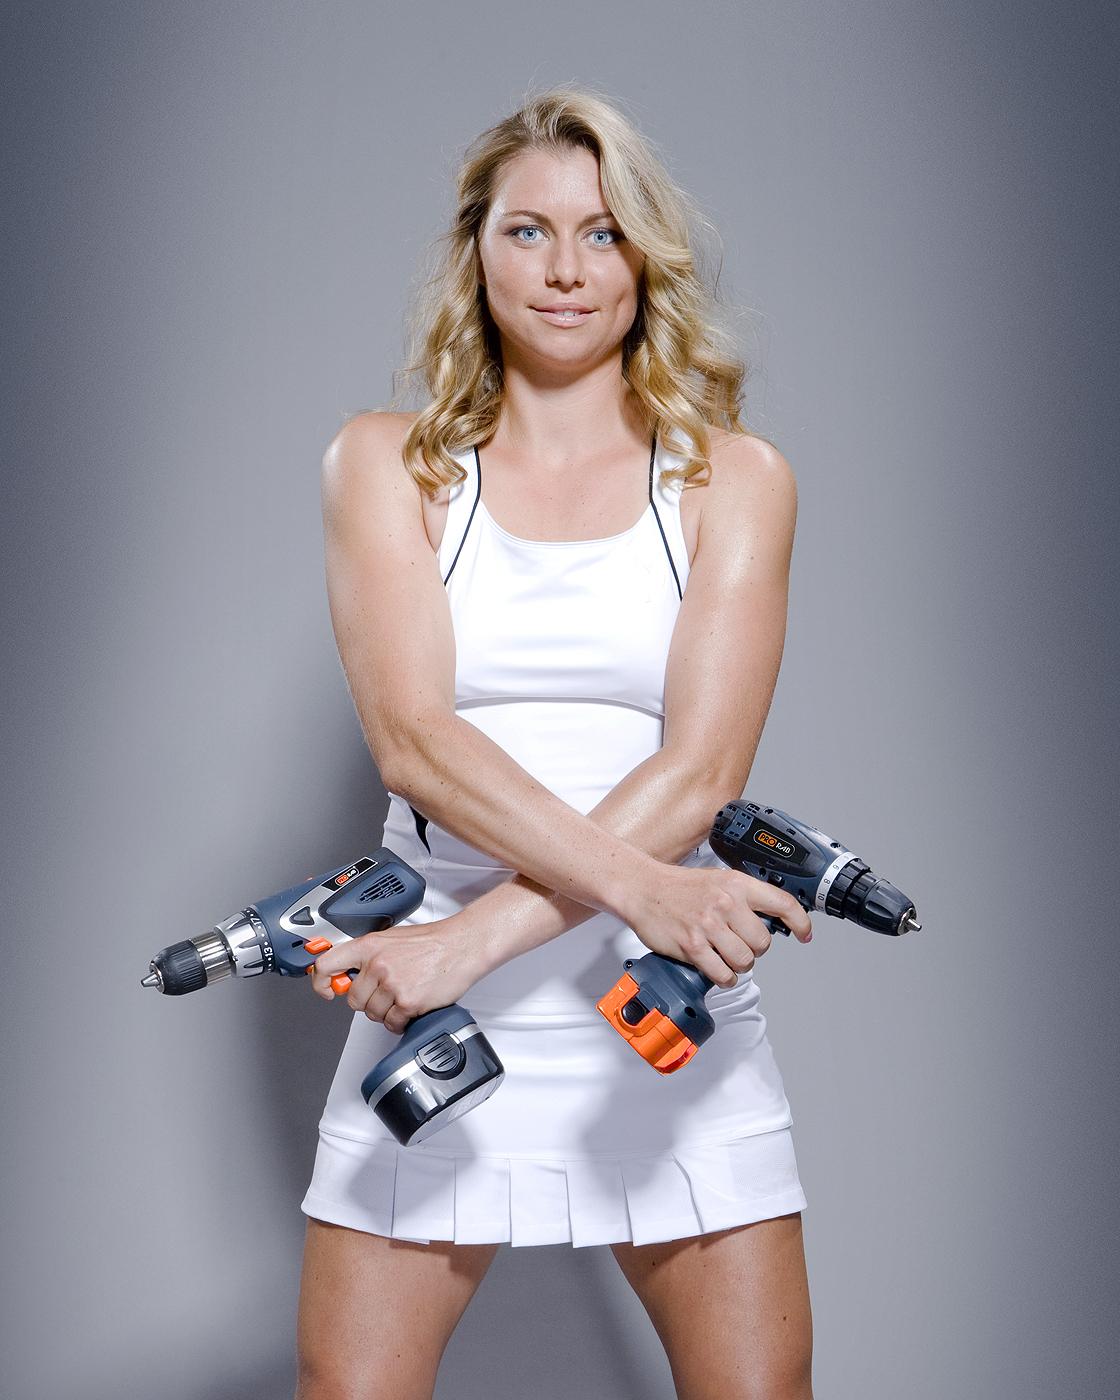 Russian Tennis Star Vera Zvonareva Hot Pics